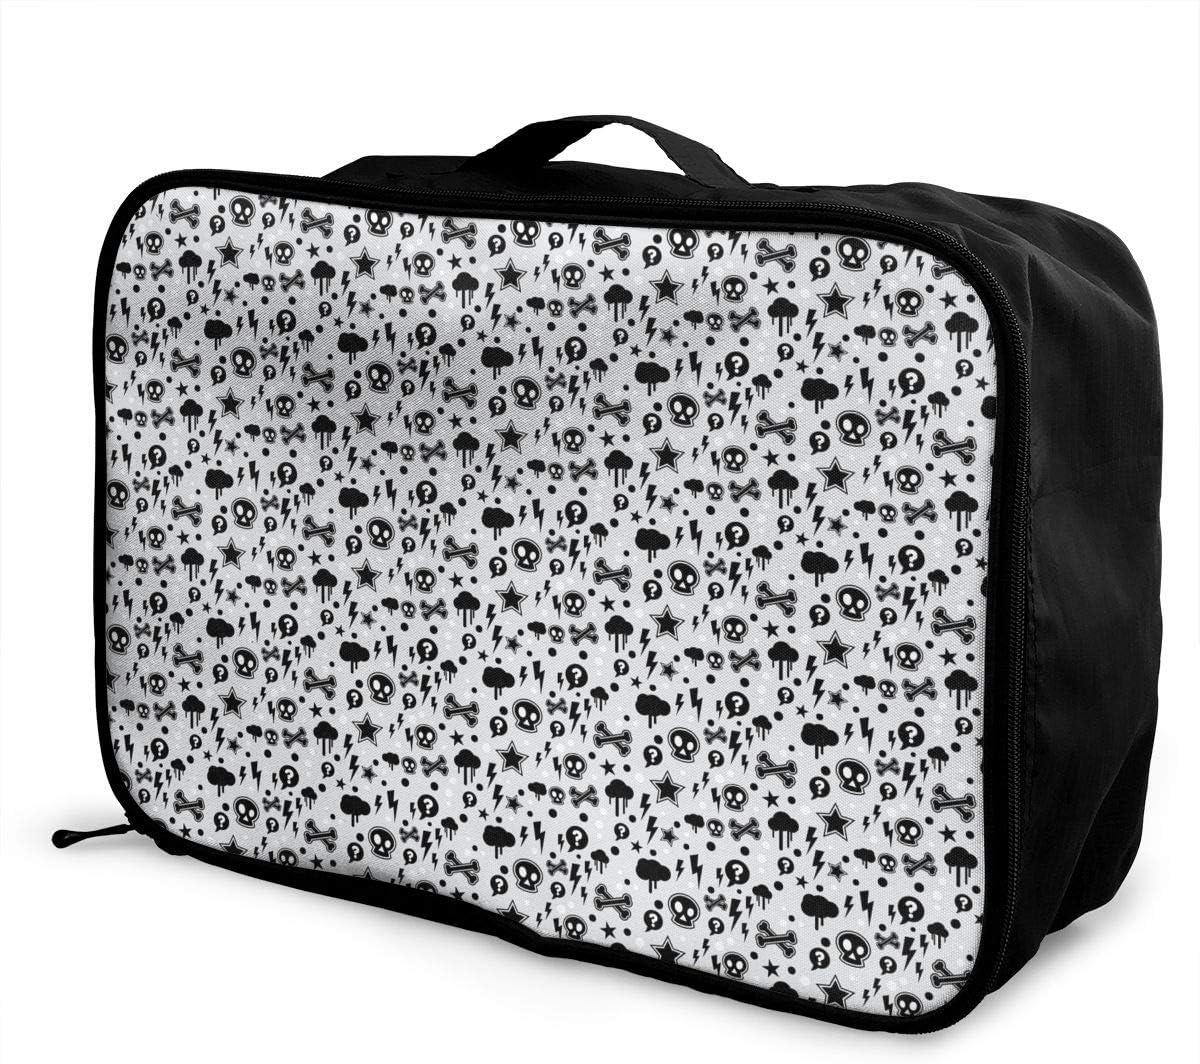 Skulls Travel Carry-on Luggage Weekender Bag Overnight Tote Flight Duffel In Trolley Handle